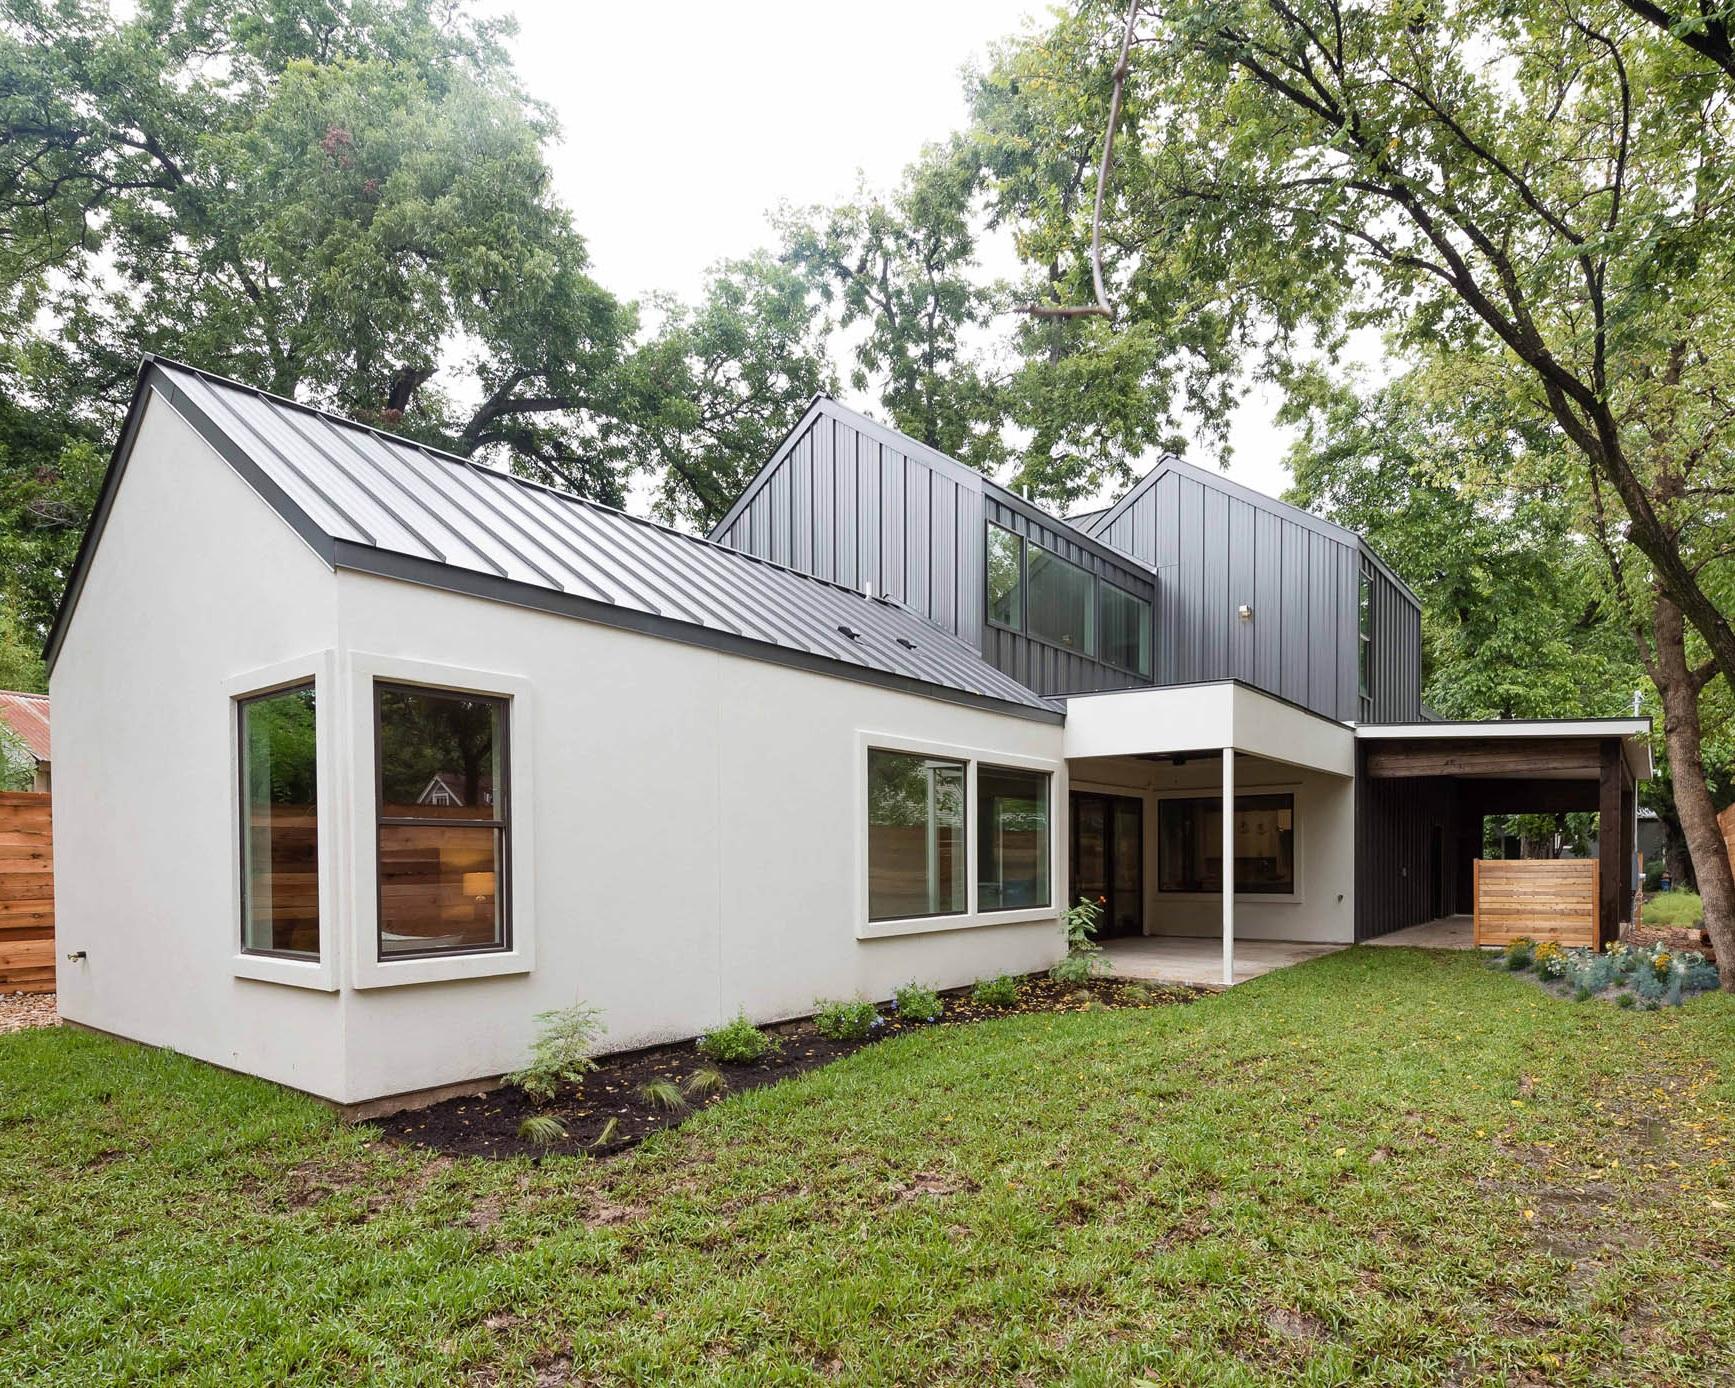 Hogan_Architects_Residential_austin_custom_hyde_park_avenue_backyard.jpg